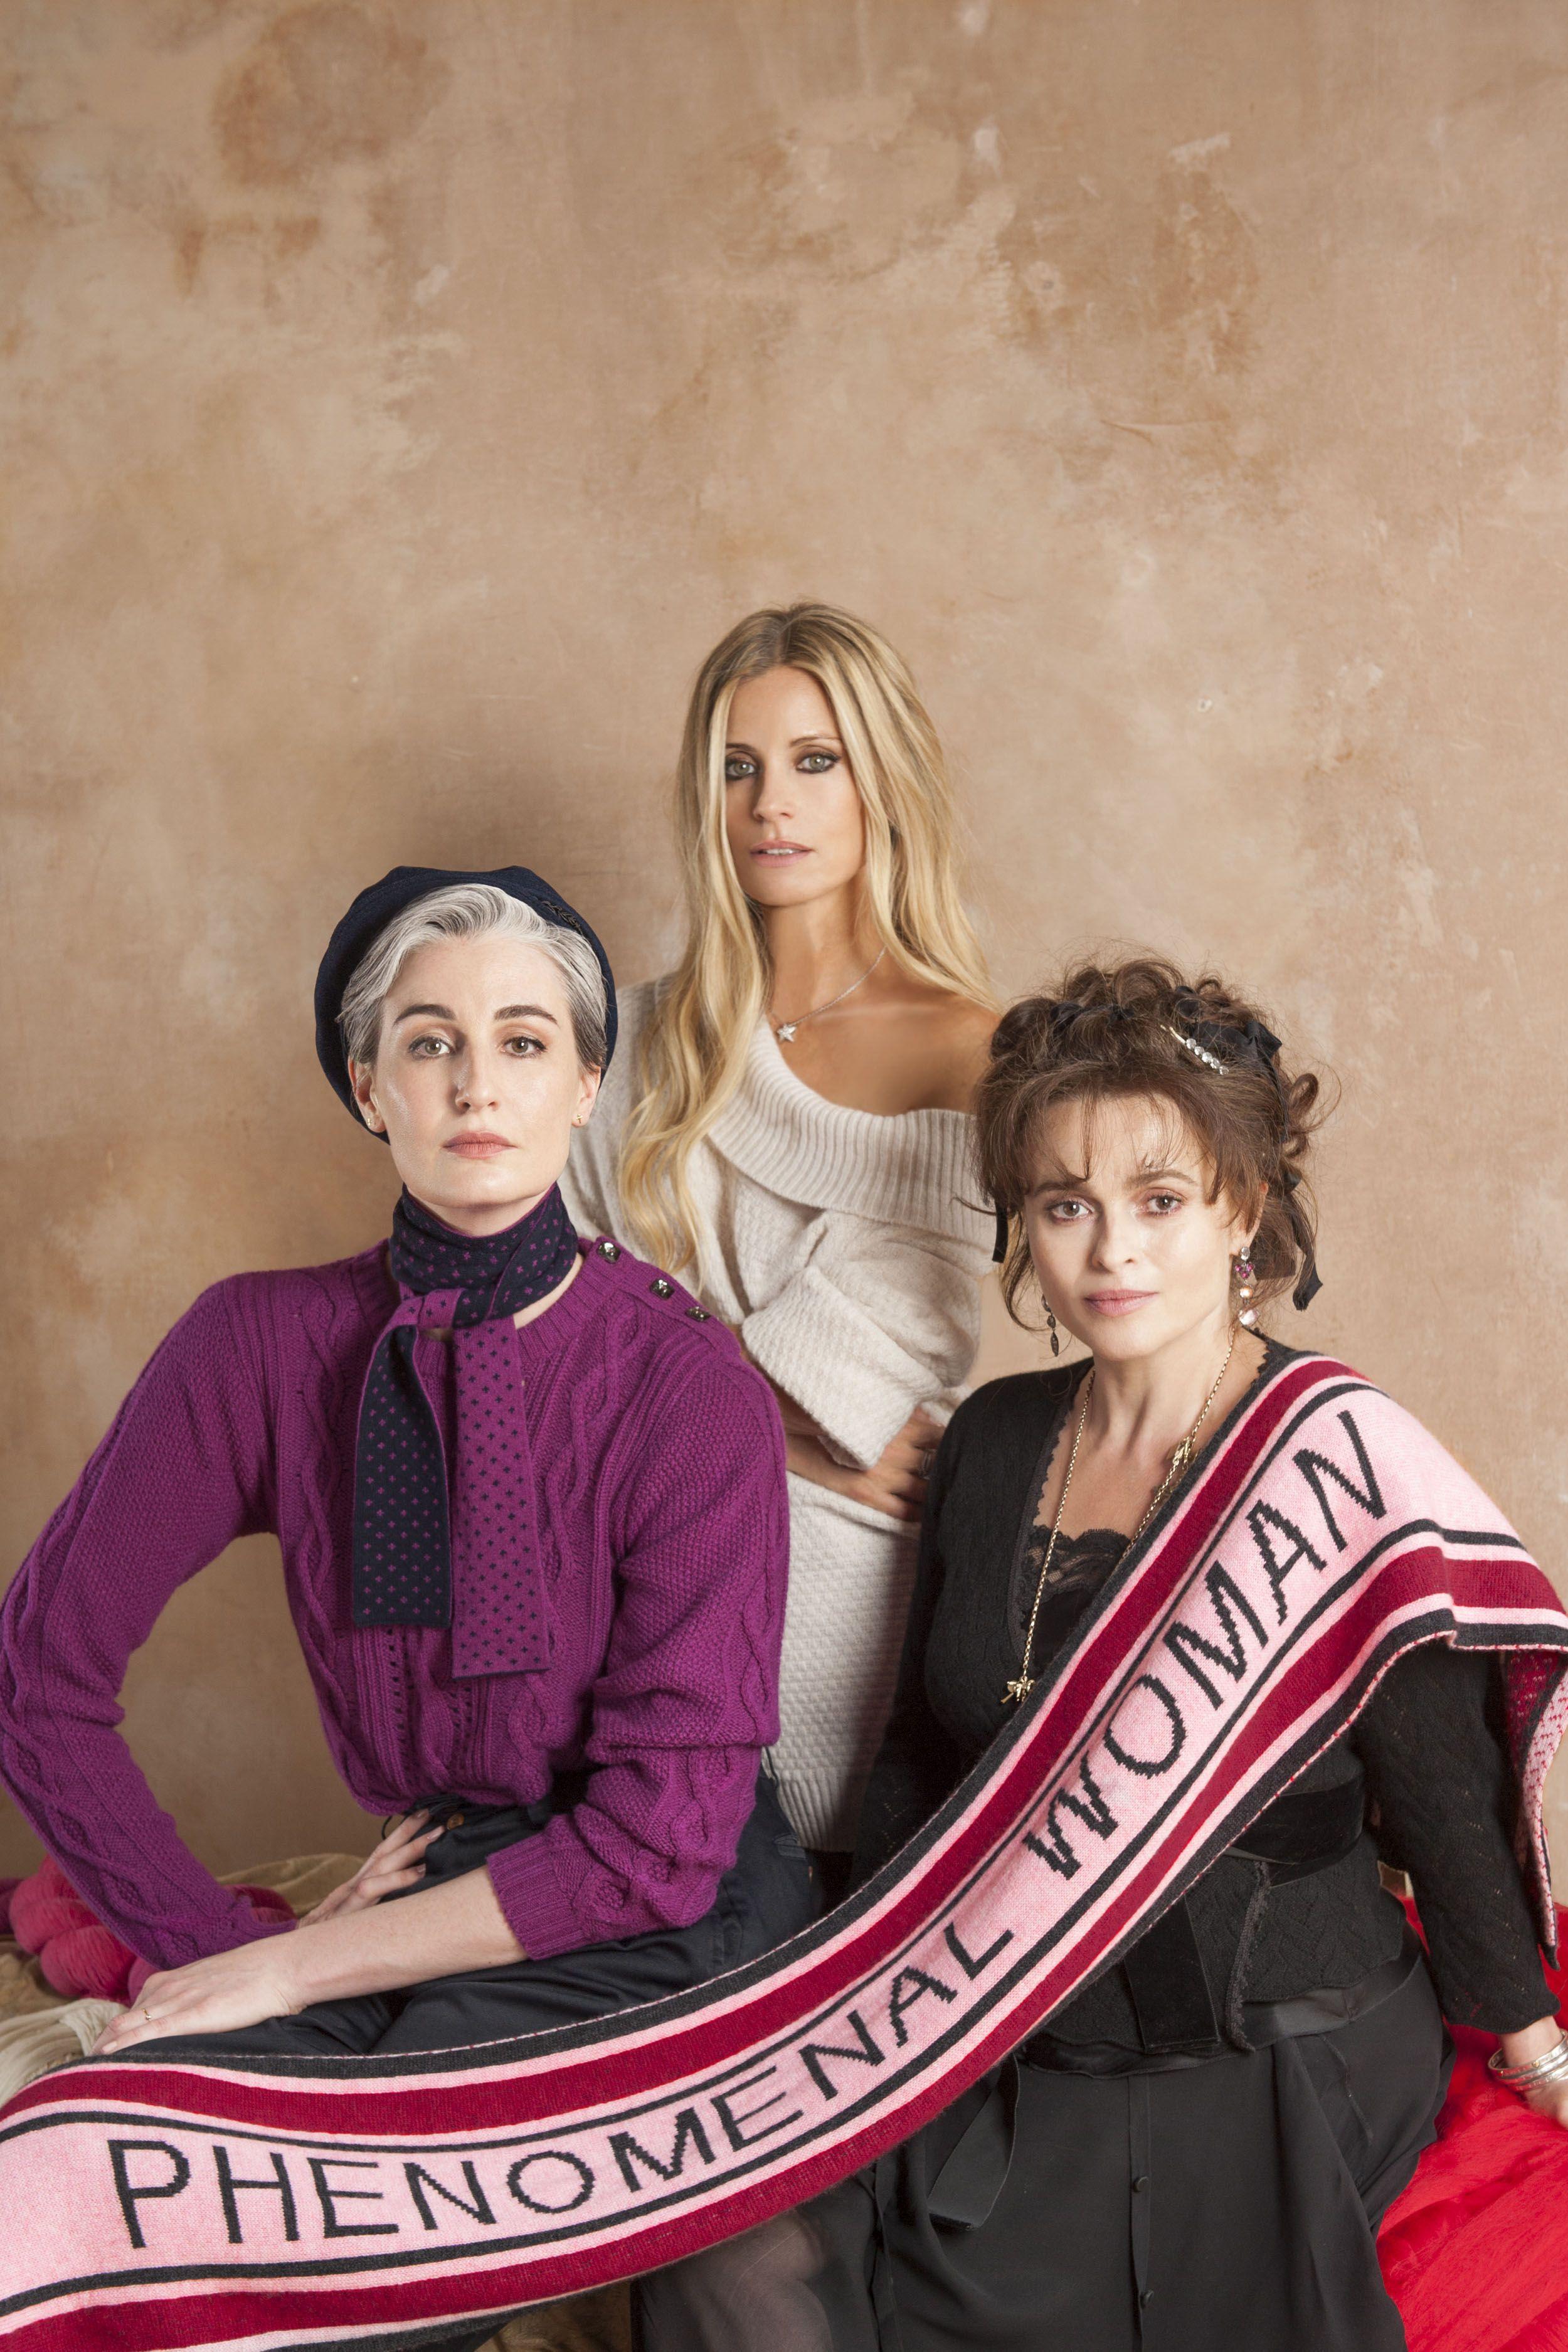 Helena Bonham Carter has designed winter's best feminist accessory